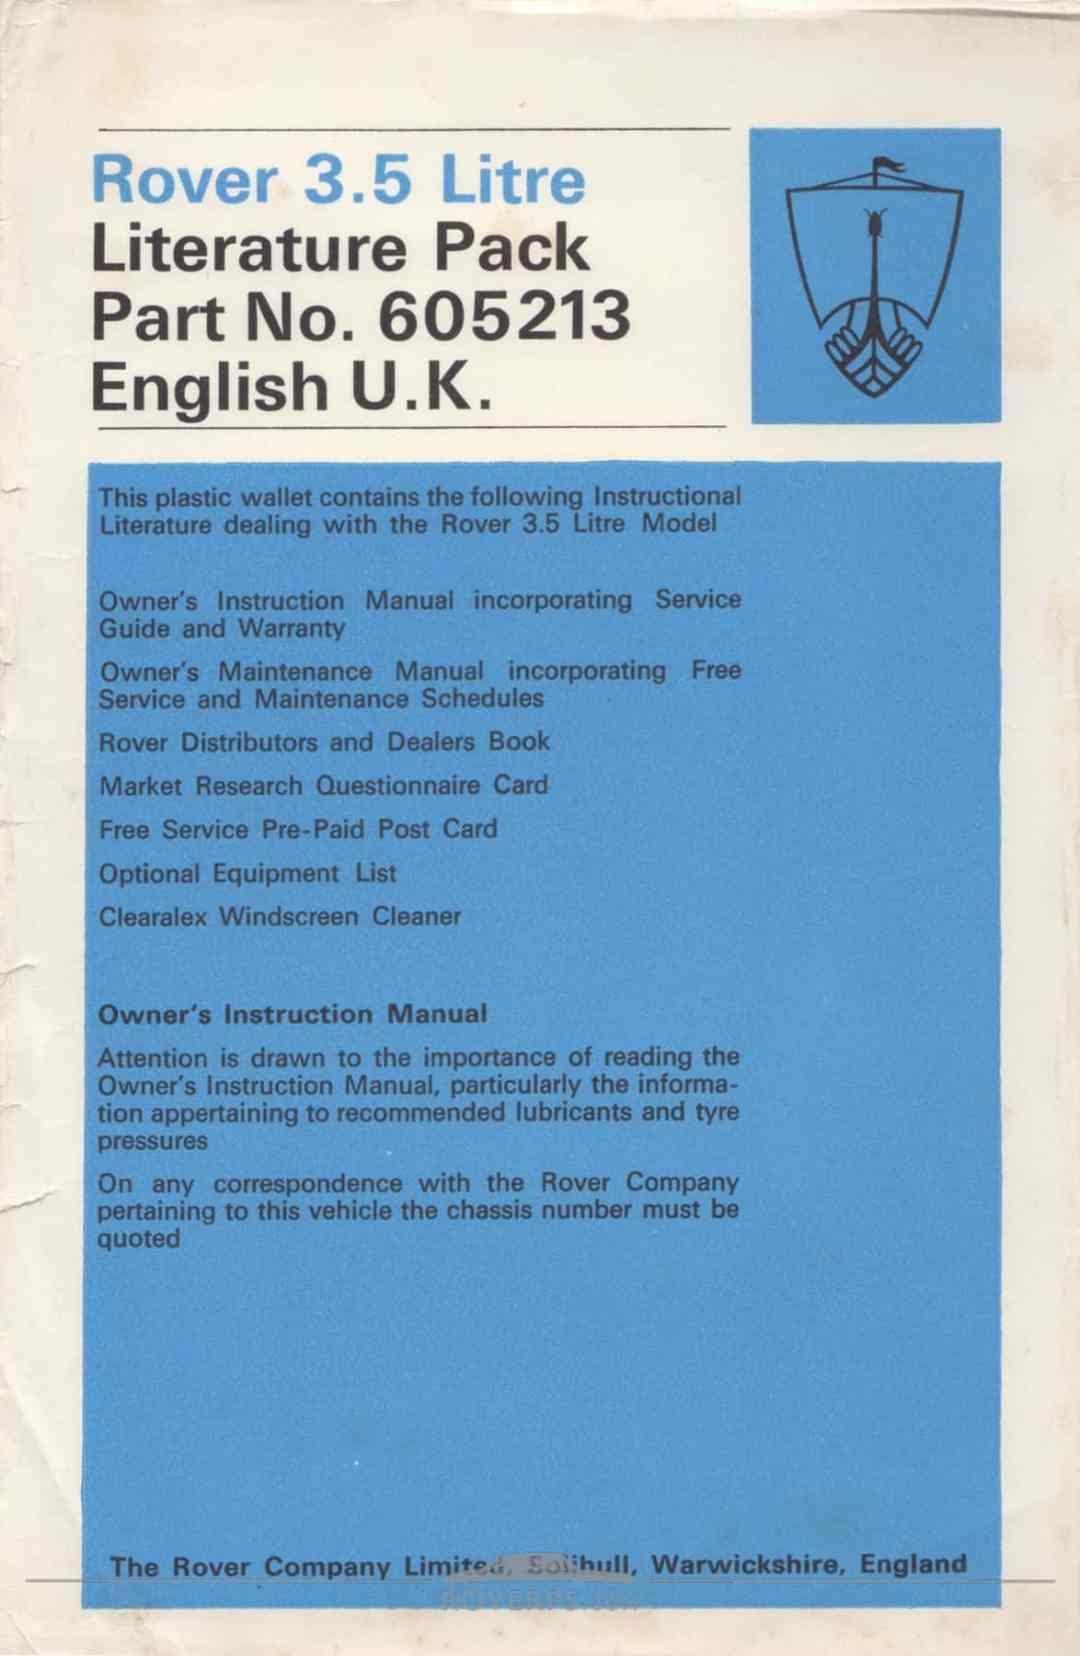 Literature Pack - 1968 - Rover 3.5 Litre Literature Pack